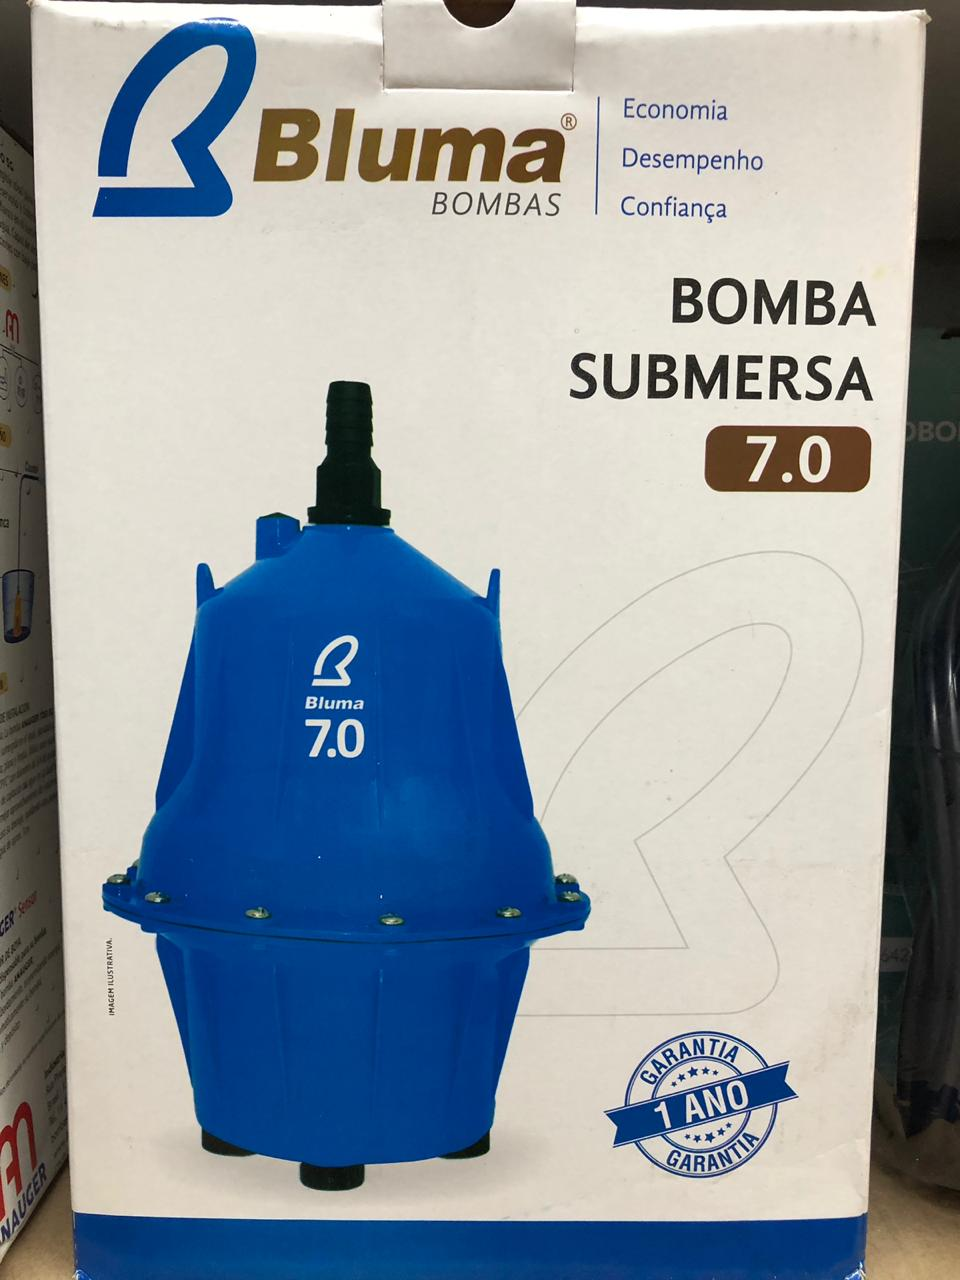 BOMBA DYMAR BLUMA 7.0 220V